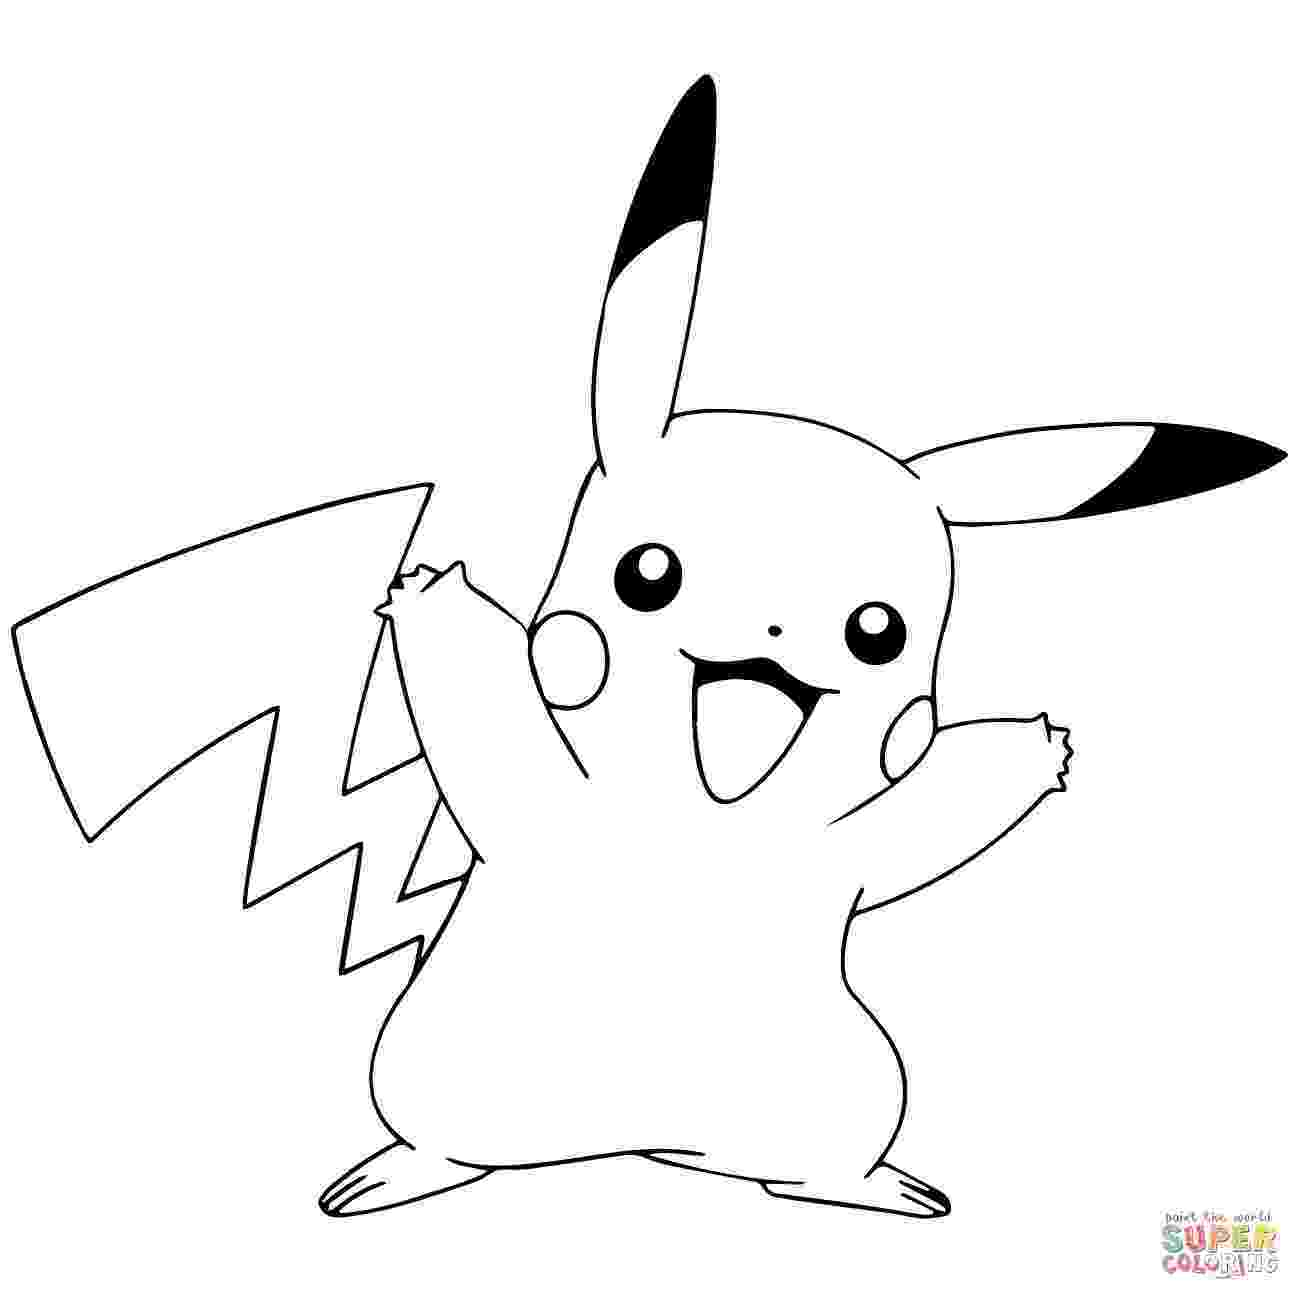 coloring pages pikachu pikachu pokemon coloring pages getcoloringpagescom pages pikachu coloring